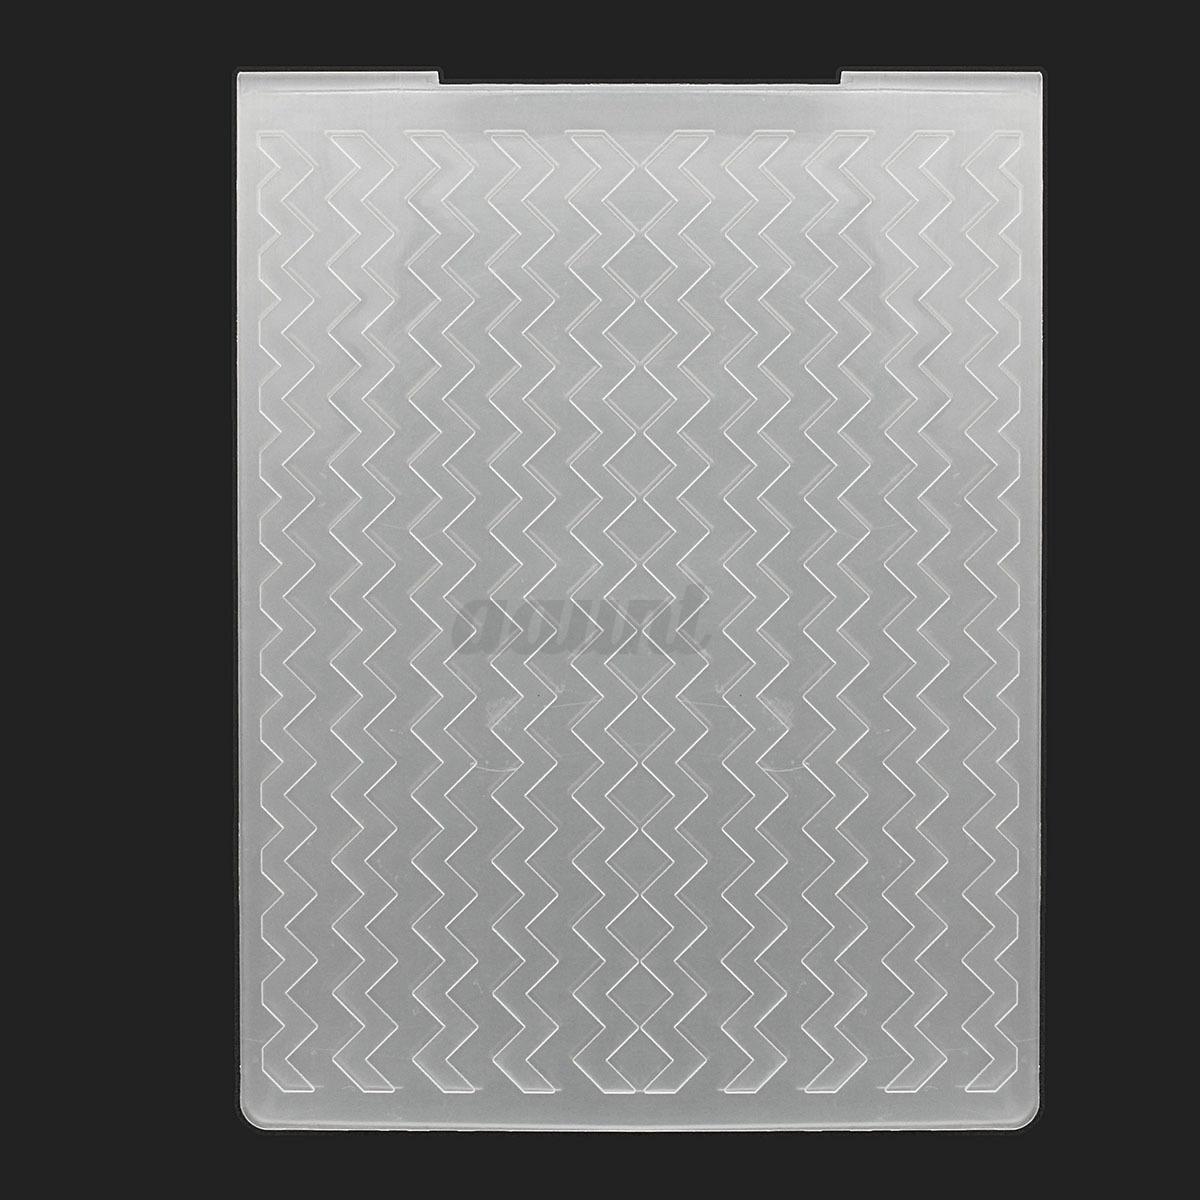 plastic embossing folder diy scrapbooking album card cutting dies template craft ebay. Black Bedroom Furniture Sets. Home Design Ideas